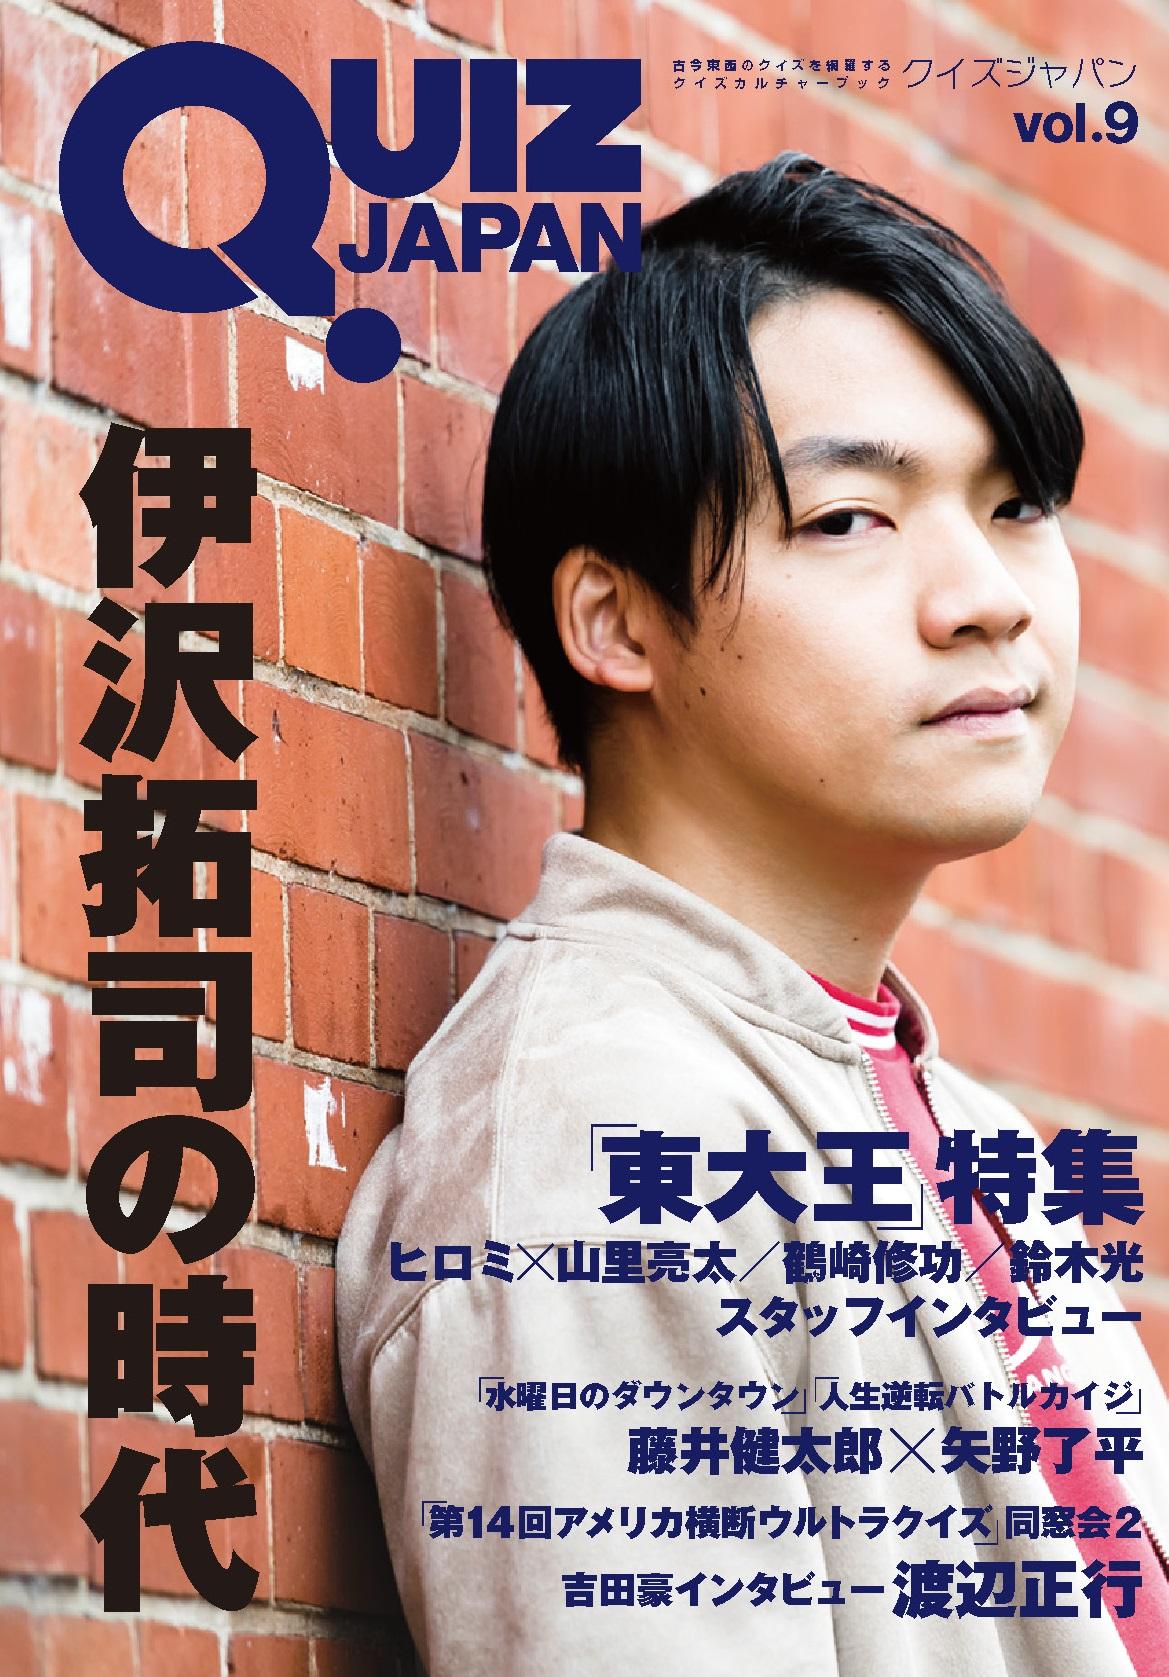 「QUIZ JAPAN vol.9」7月1日発売決定! 表紙&巻頭特集は東大生クイズ王・伊沢拓司!